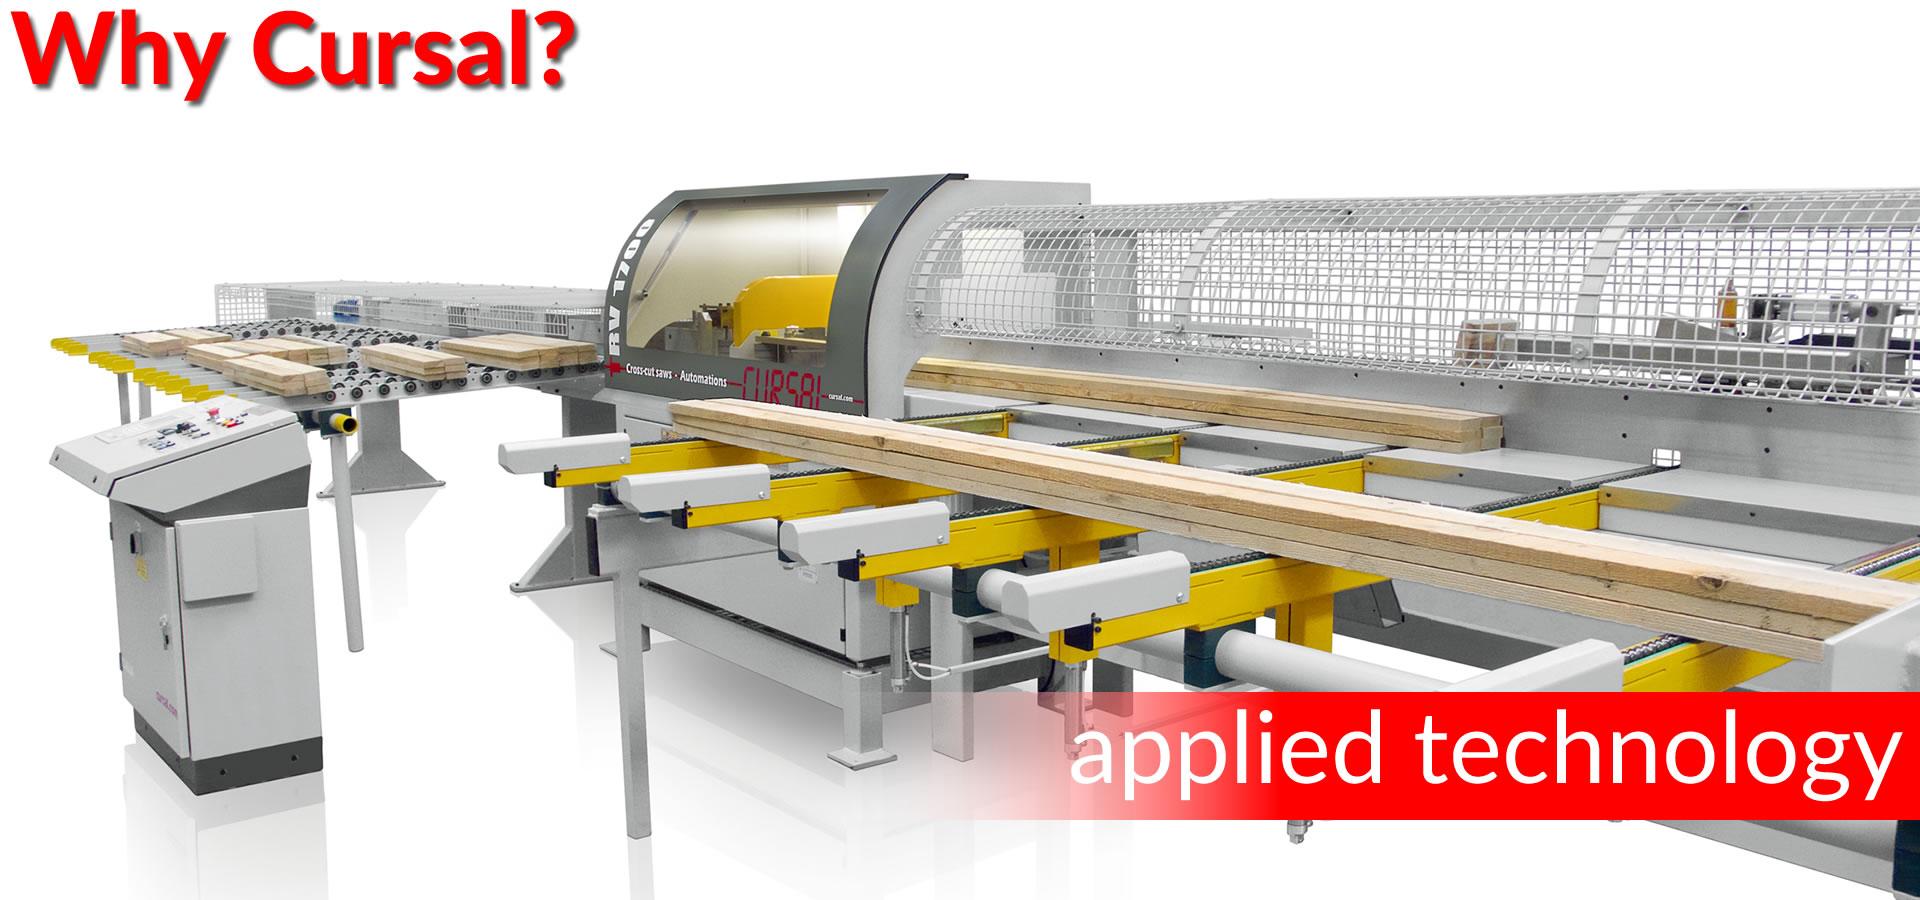 cursal applied technology